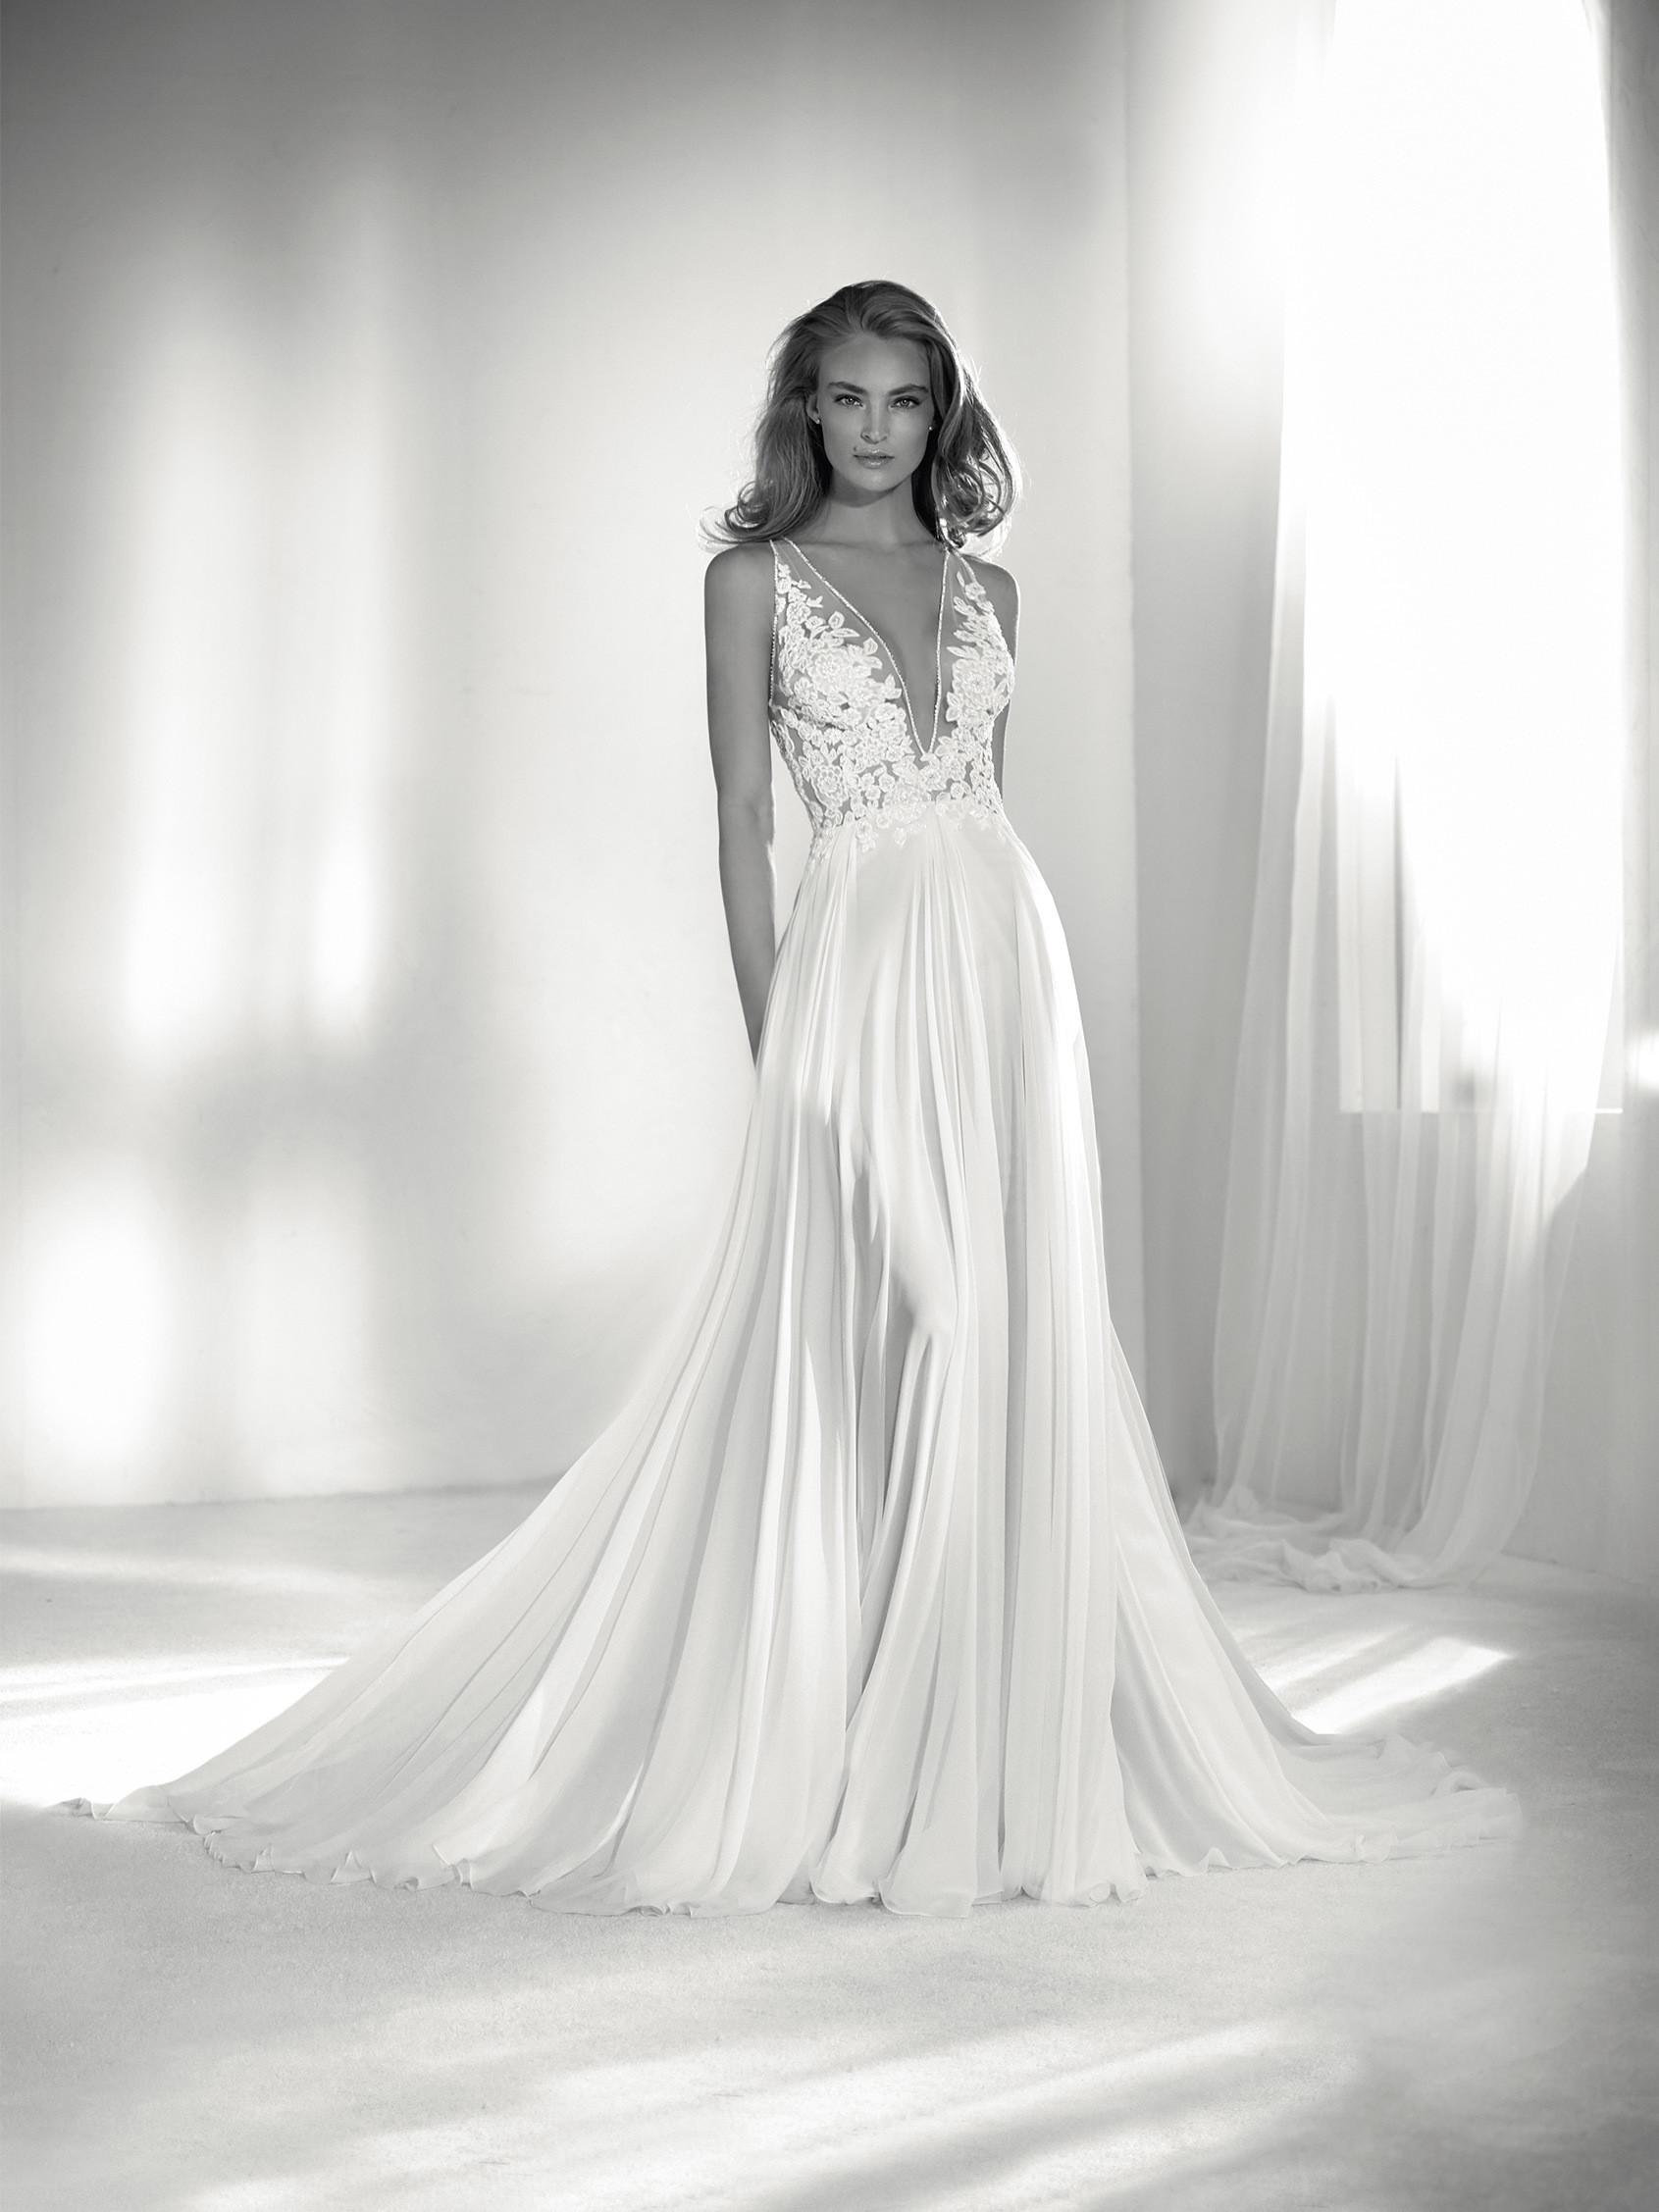 Mira Couture Atelier Pronovias Riada Wedding Gown Bridal Dress Chicago Boutique Front